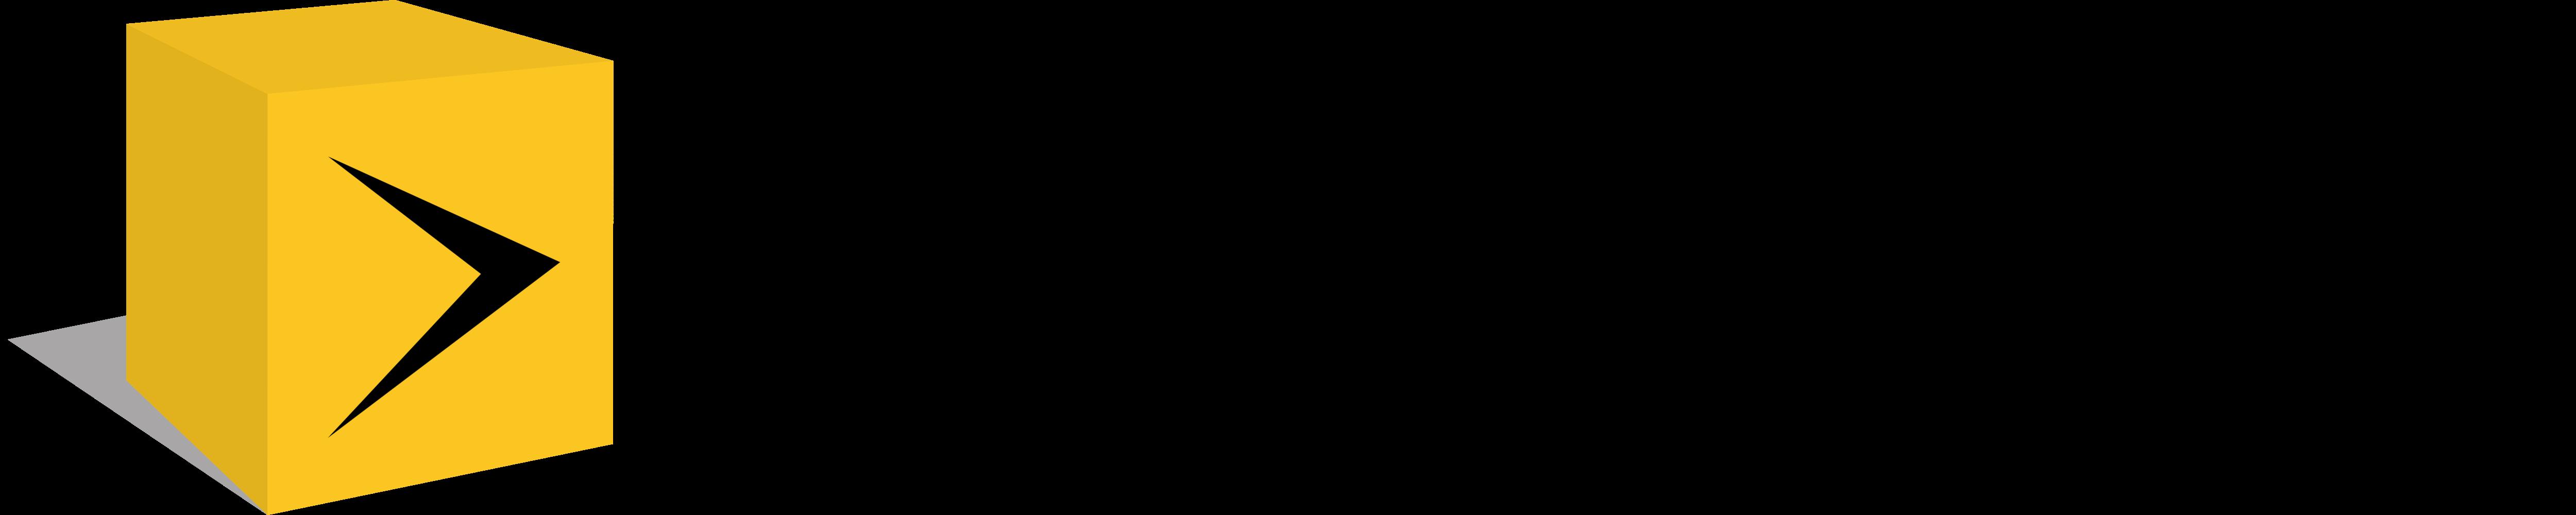 Vid otron mobile logos download for Mobile logo